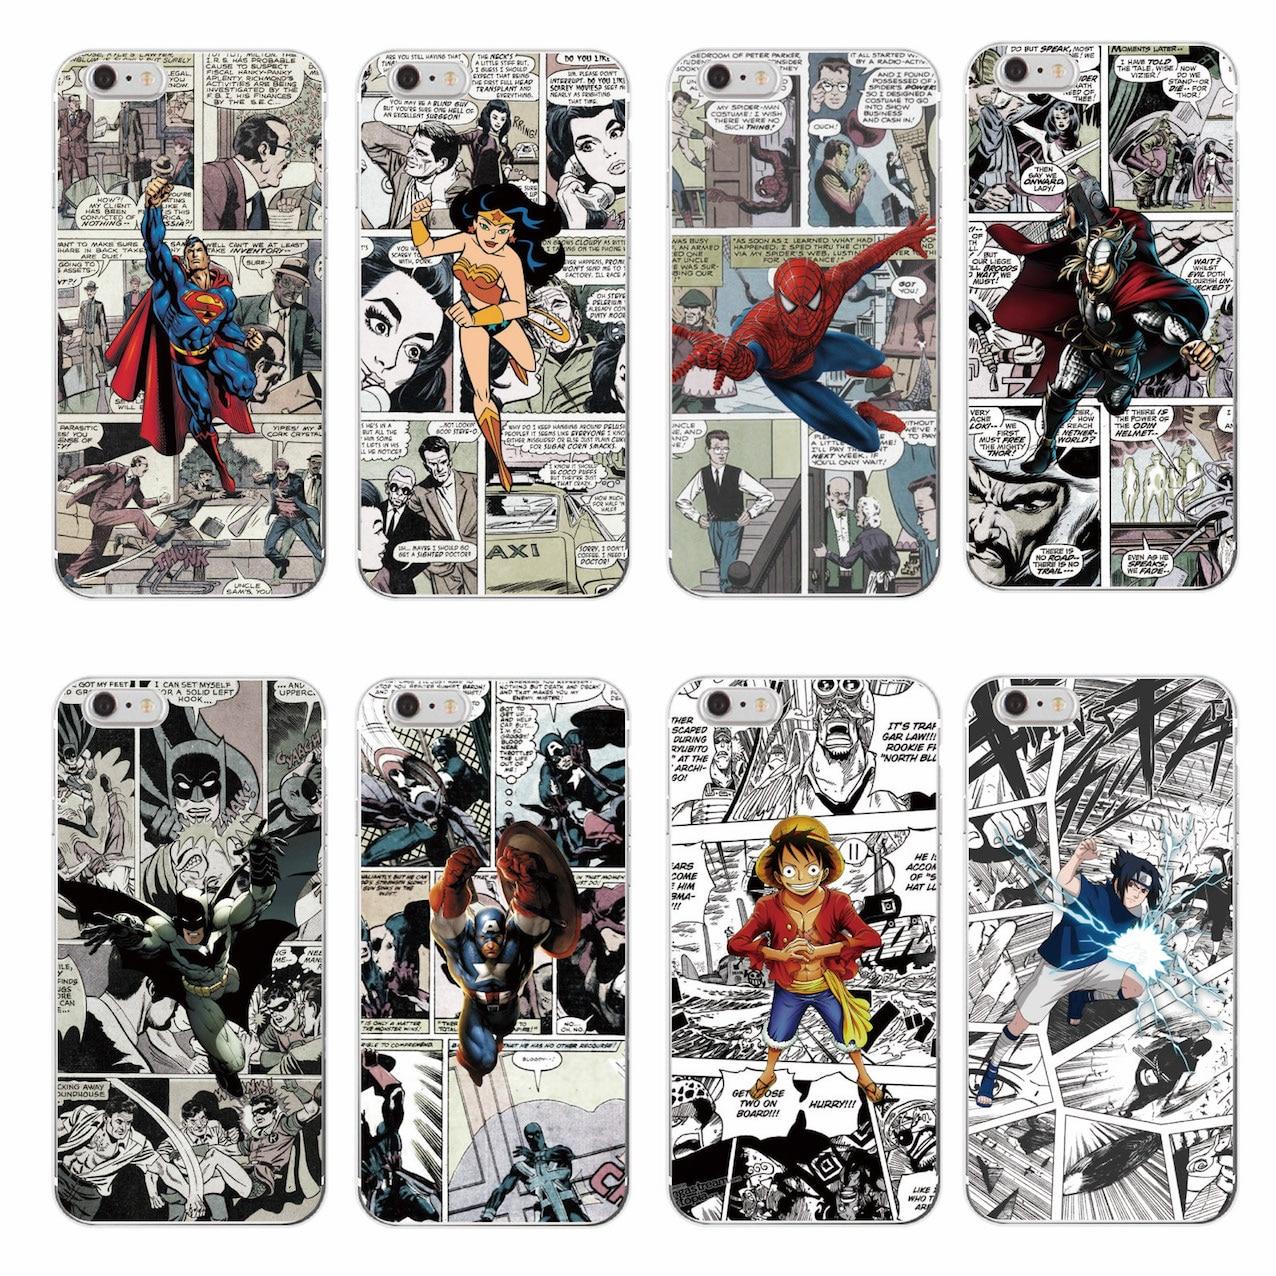 Cartoons <font><b>Marvel</b></font> <font><b>Comics</b></font> Batman <font><b>Spider</b></font> <font><b>Man</b></font> Wonder woman Captain America Soft Phone <font><b>Case</b></font> <font><b>For</b></font> <font><b>iPhone</b></font> 7 7Plus <font><b>6</b></font> 6S 6Plus 5 5S SE 5C